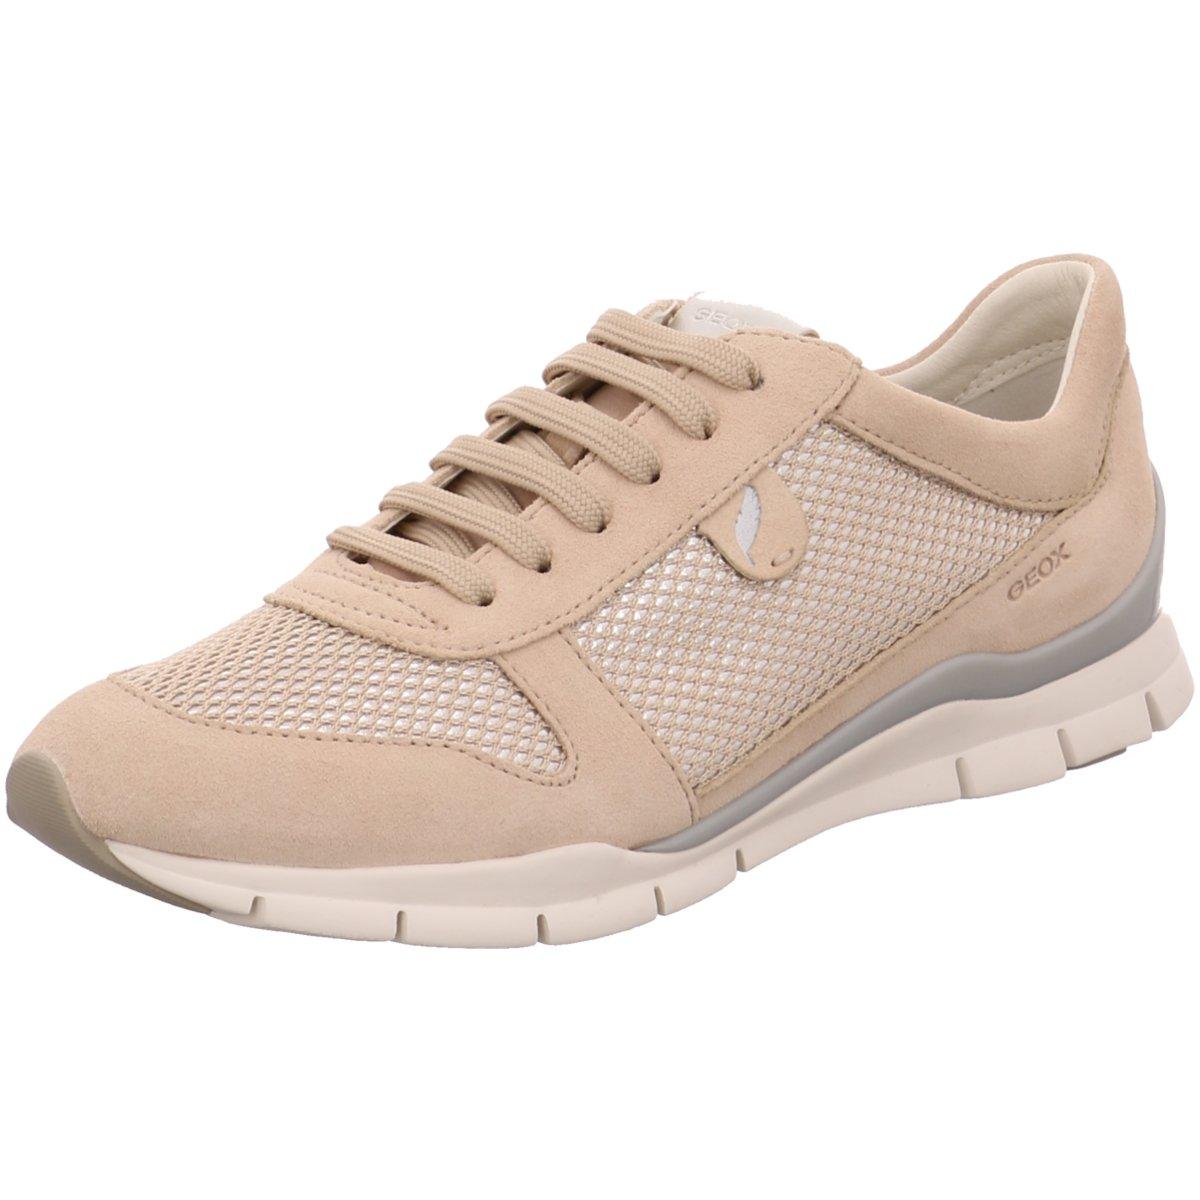 free shipping 70c17 01fe5 Details zu Geox Damen Sneaker D52F2A-022GN-C8182 skin beige 240565